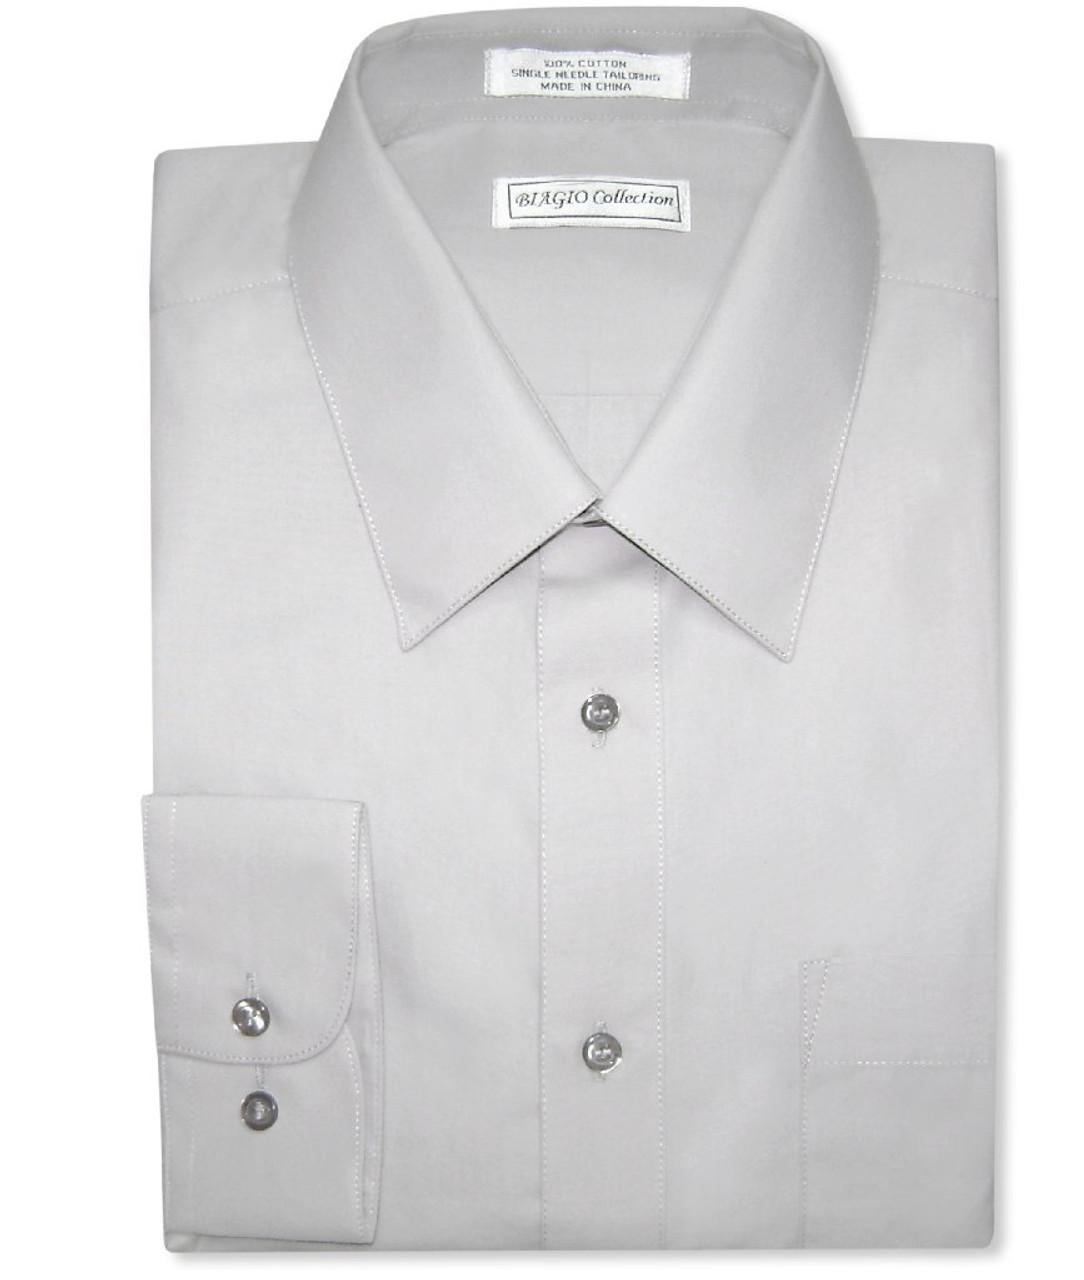 Biagio Mens 100/% COTTON Solid SILVER GREY Color Dress Shirt sz 17.5 34//35